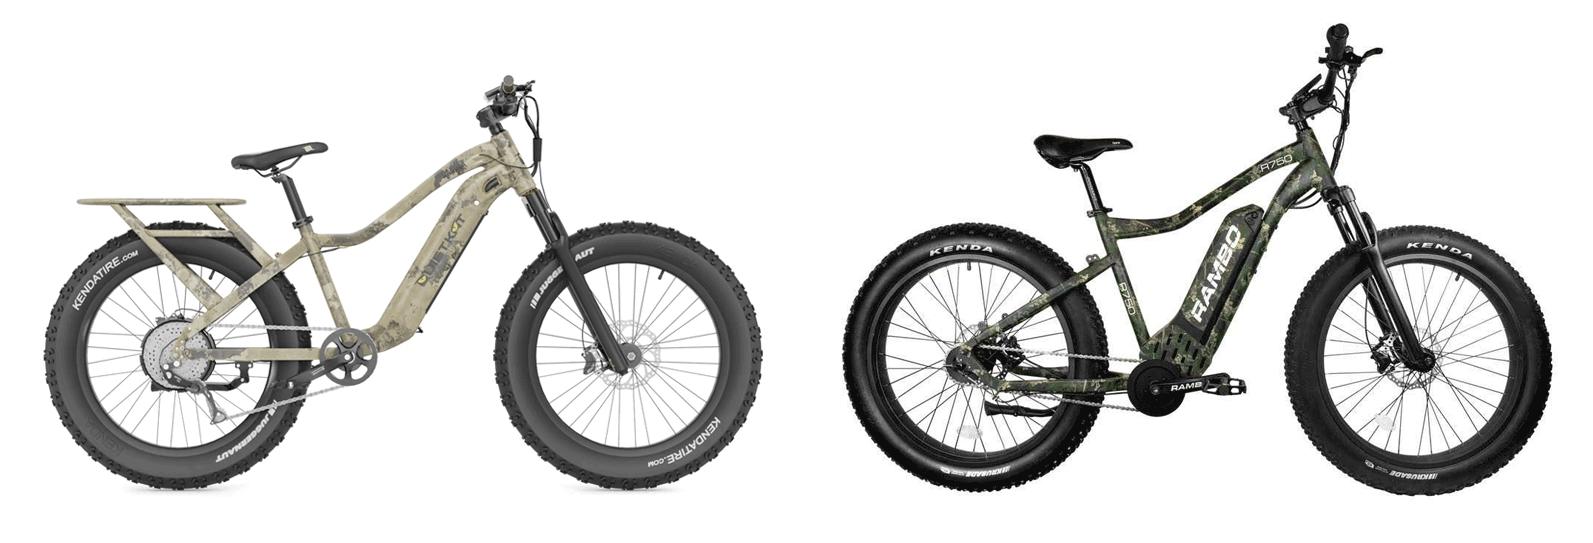 QuietKat Ranger hunting bike vs Rambo Bikes the Roamer